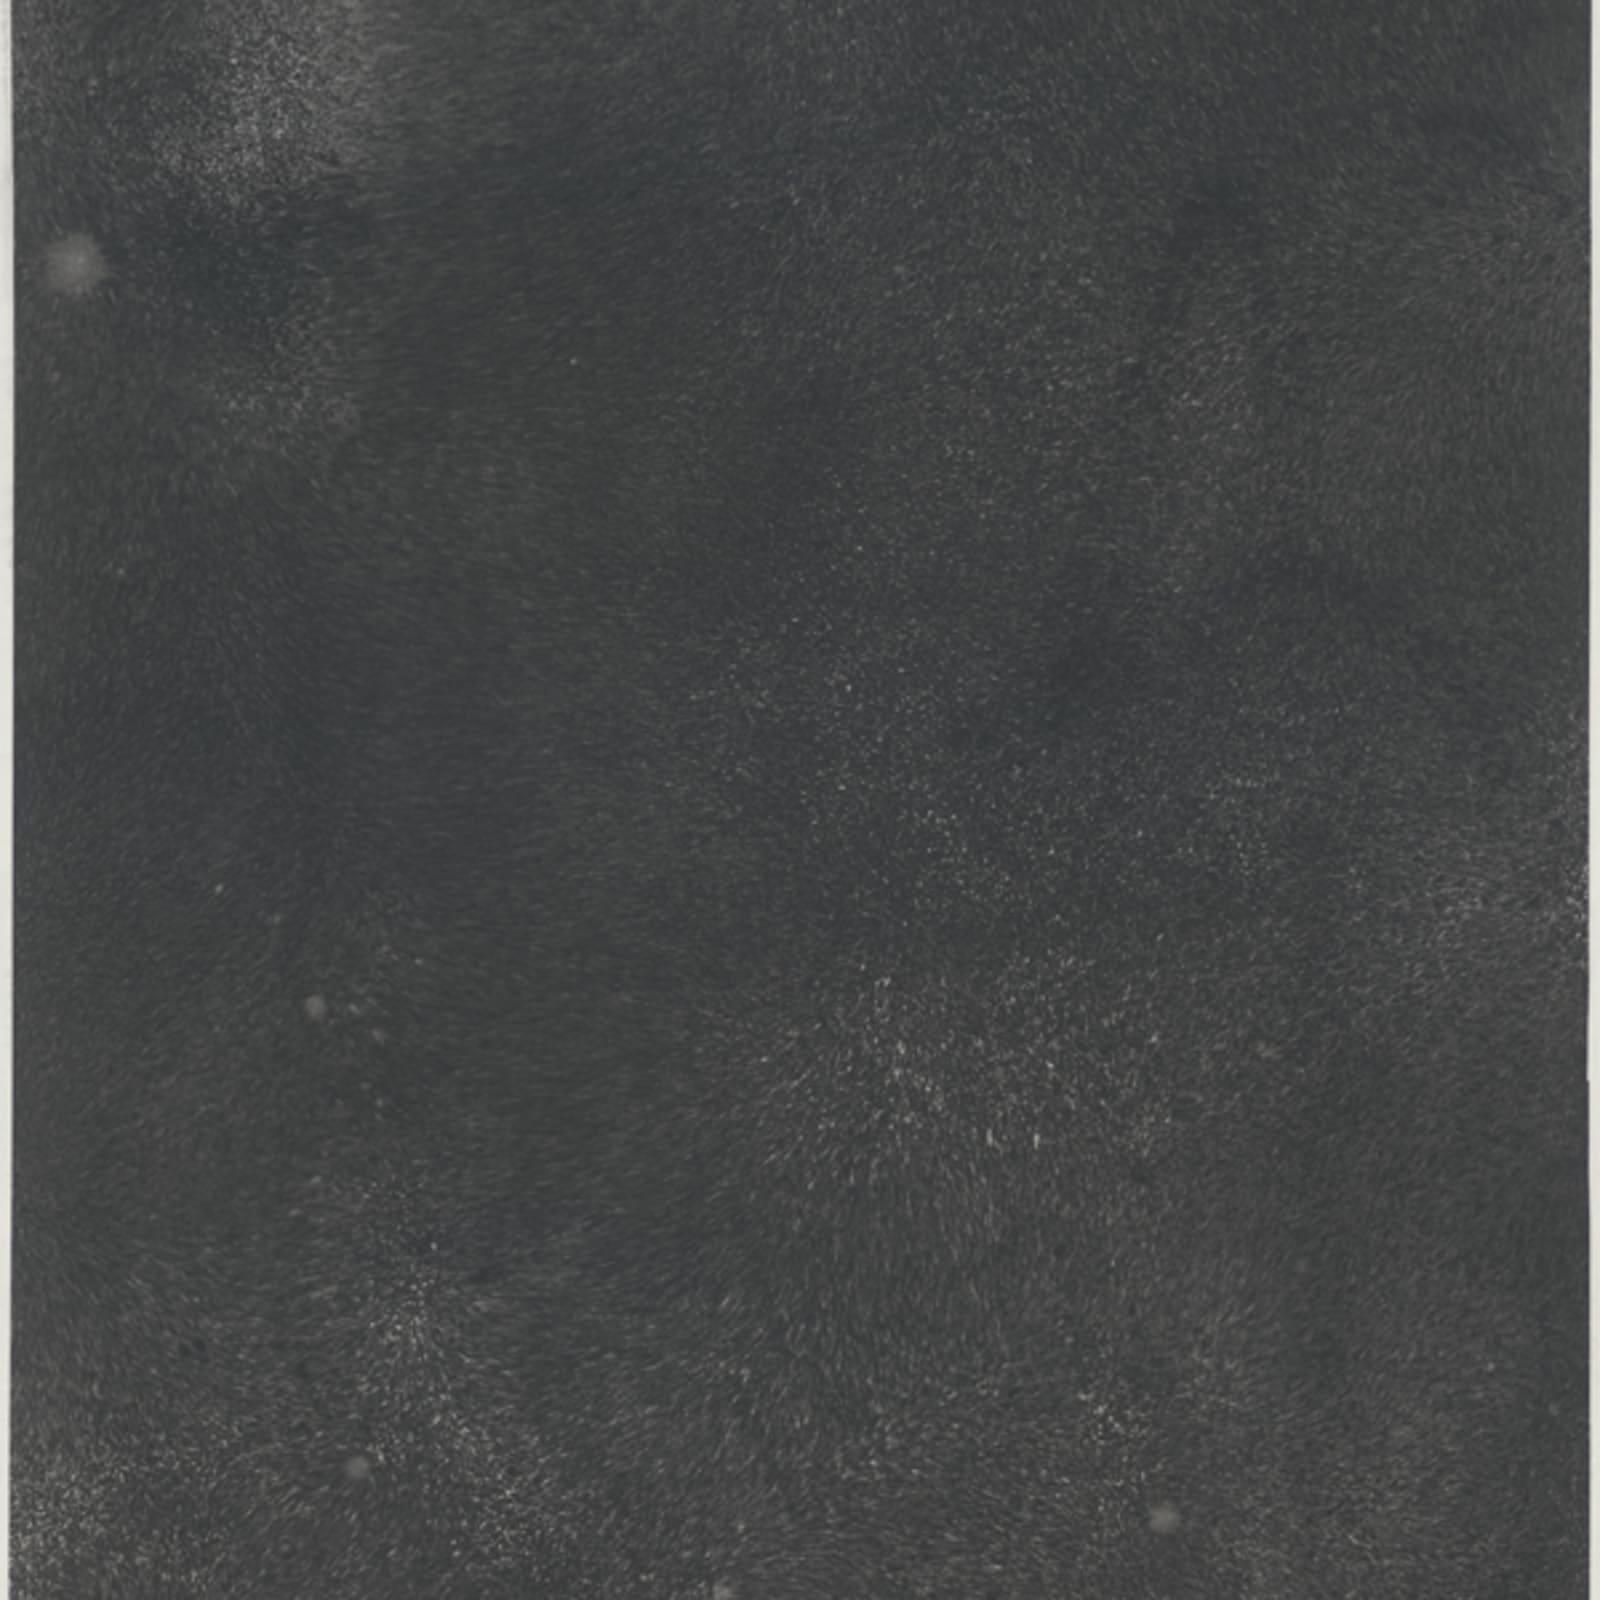 Bingyi 冰逸, Quantum: Infinity 量子波相:无限, 2018